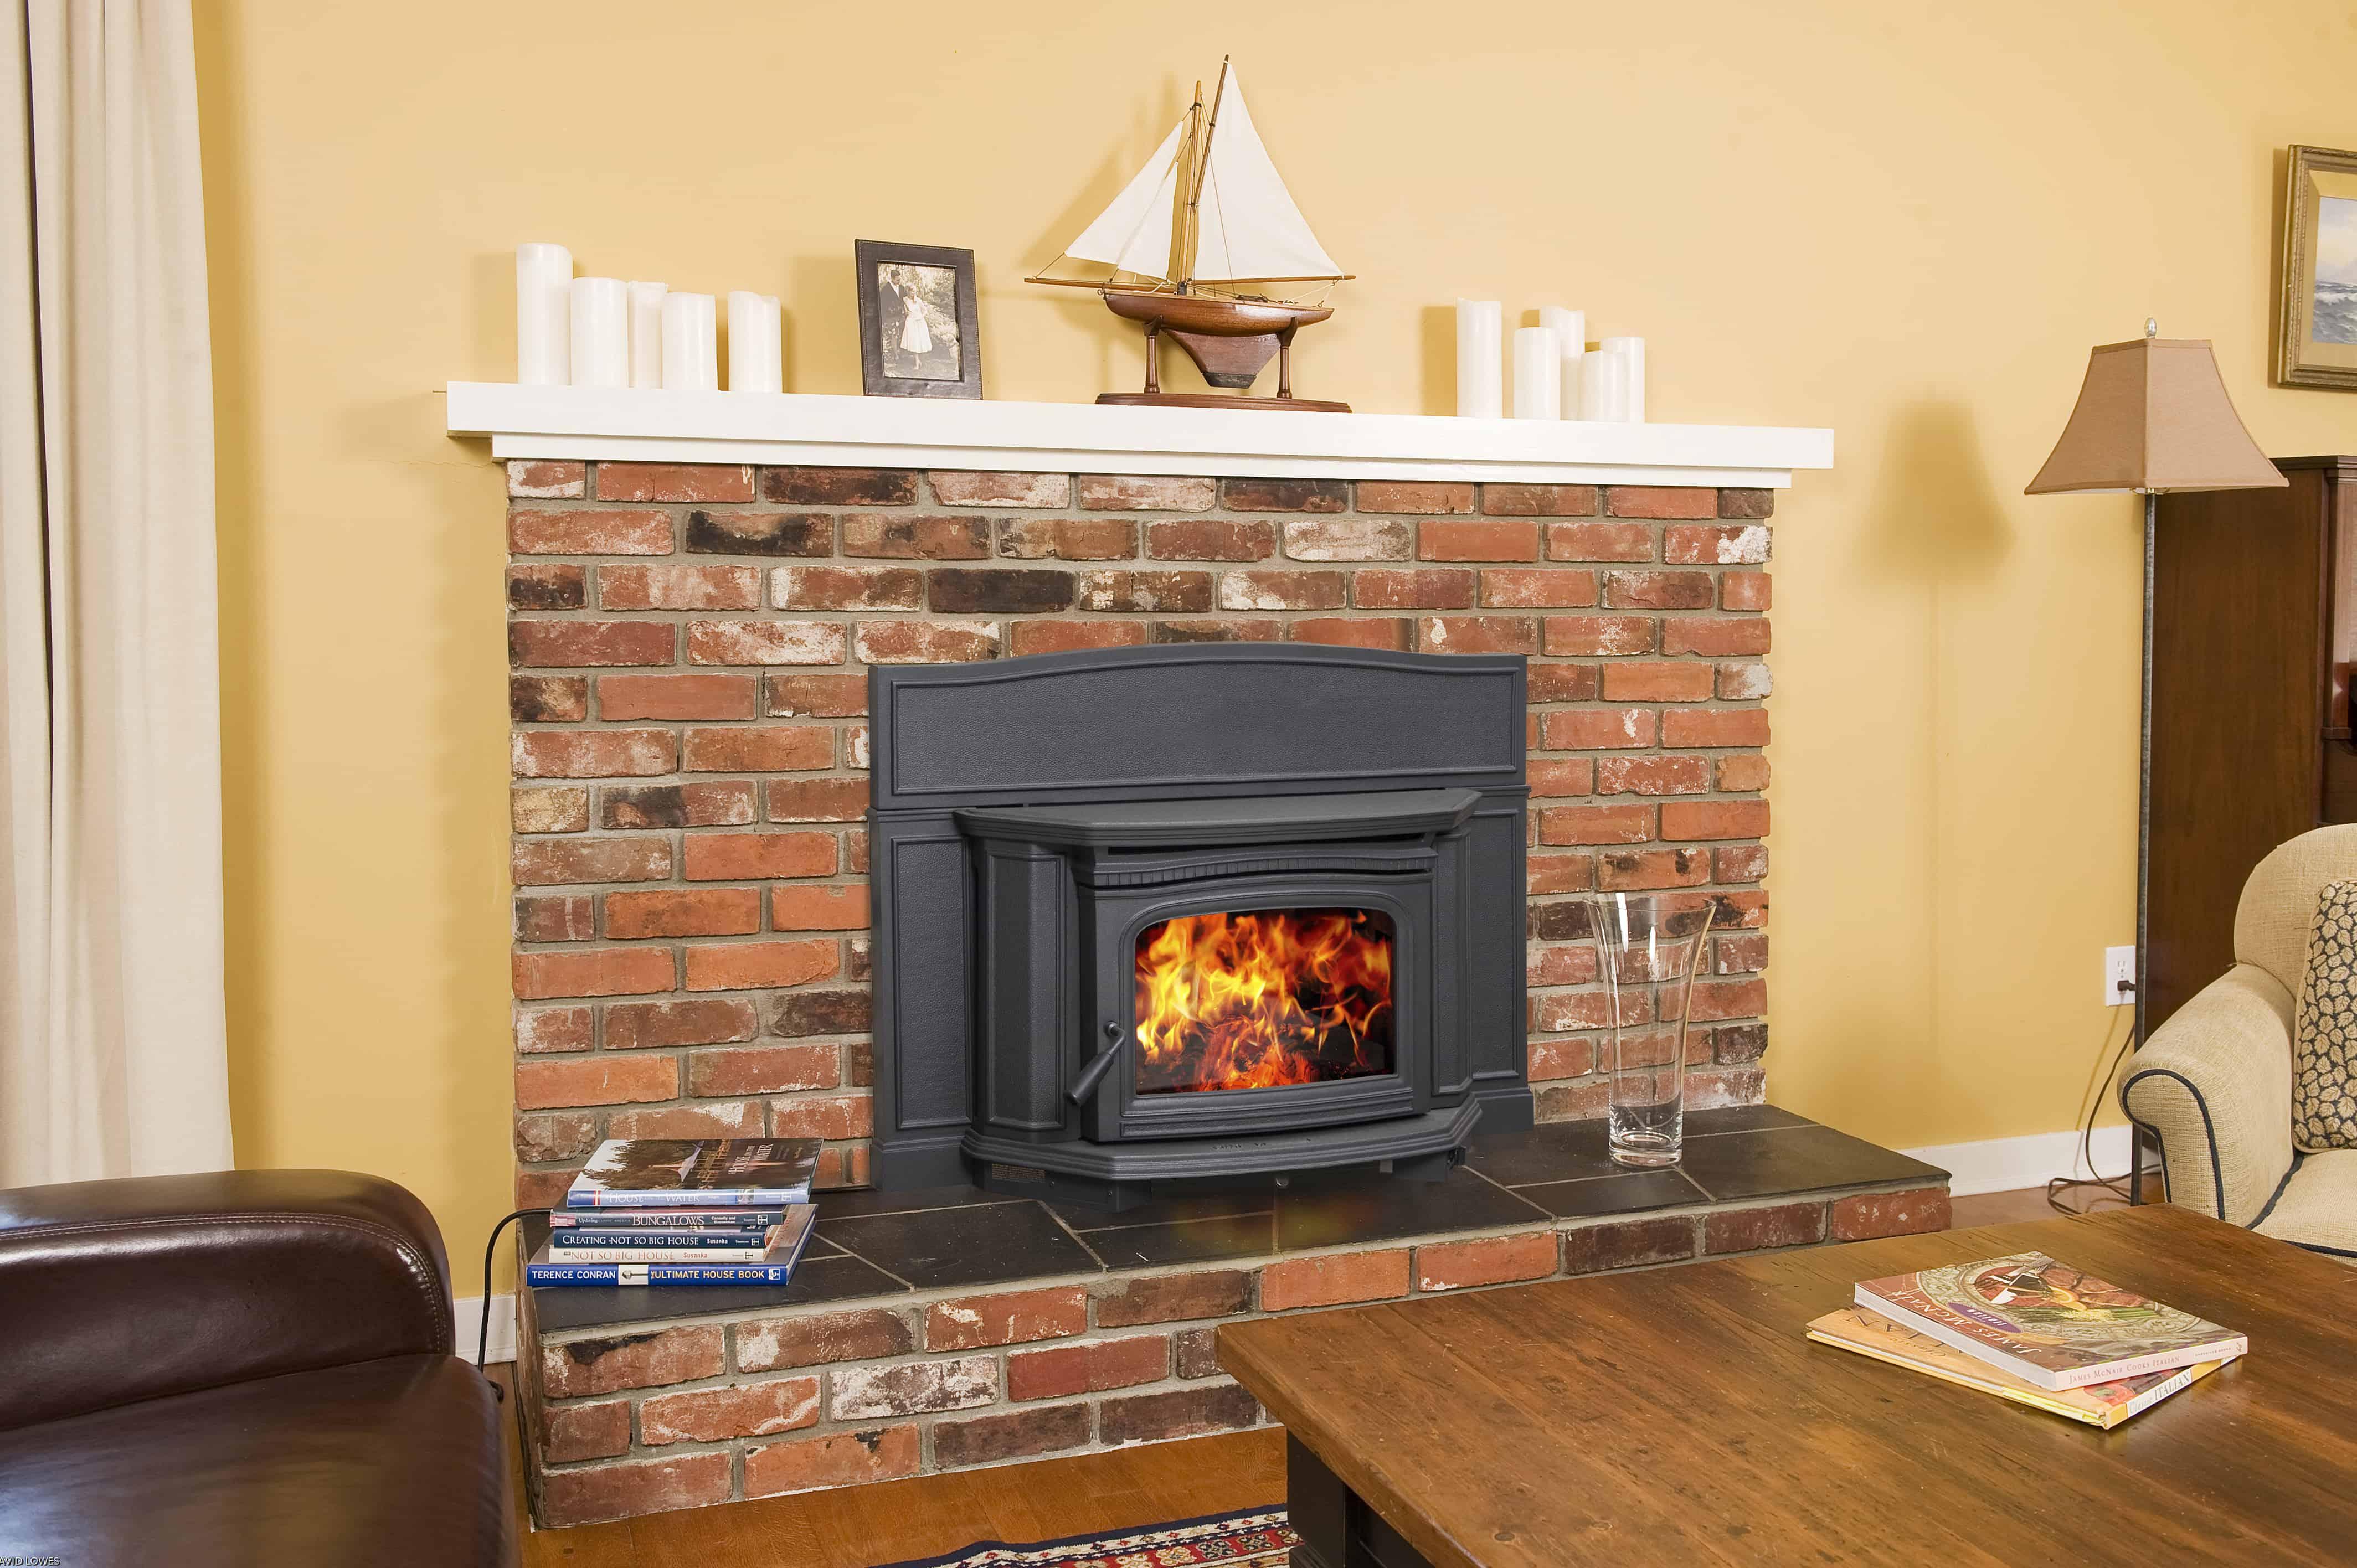 Pacific Energy Alderlea T5 Le Wood Fireplace Insert Safe